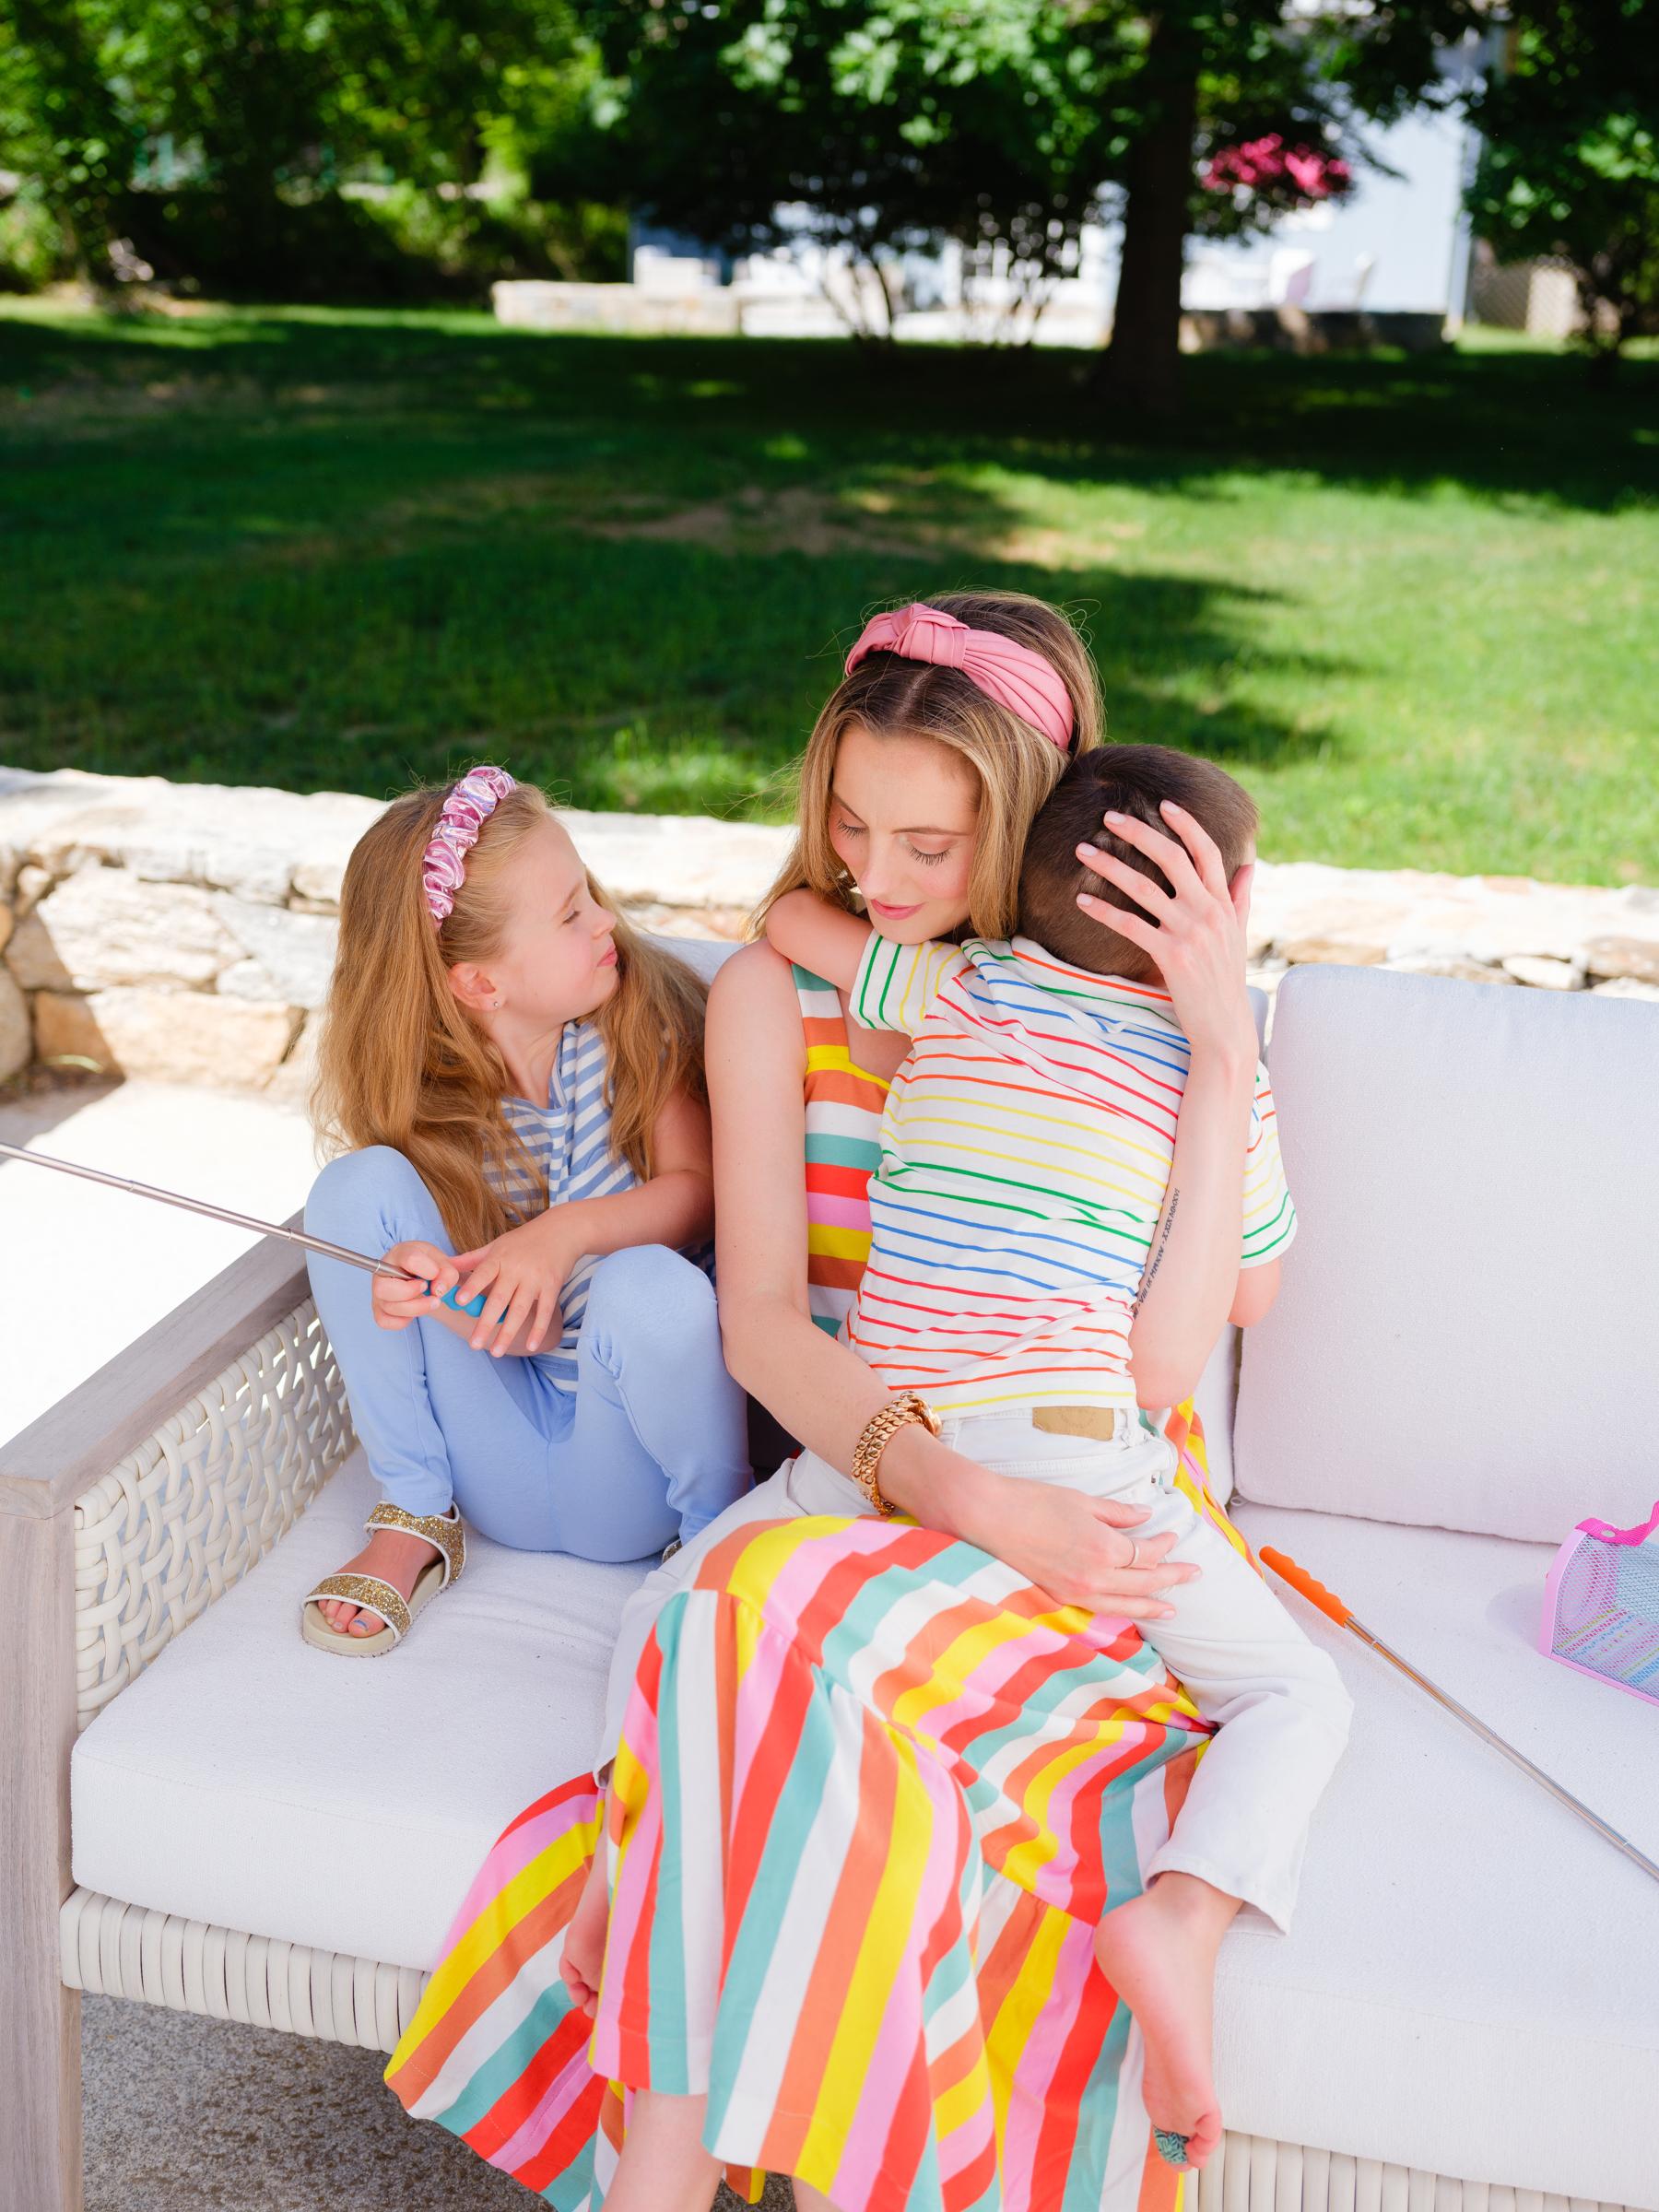 Eva Amurri shares her striped style roundup